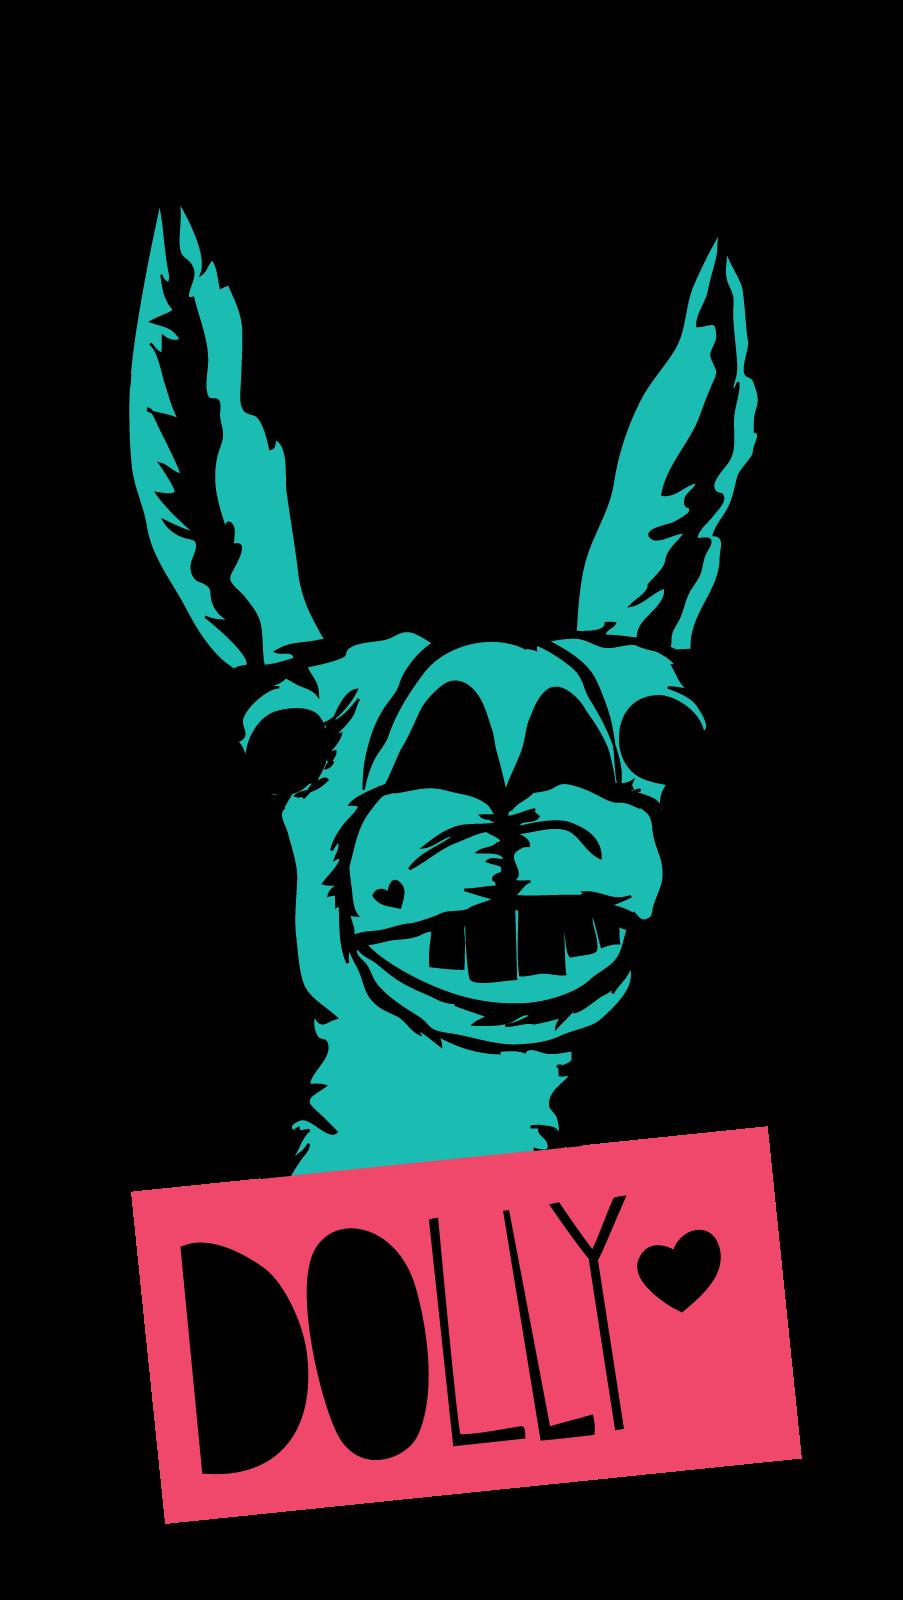 Dolly The Llama